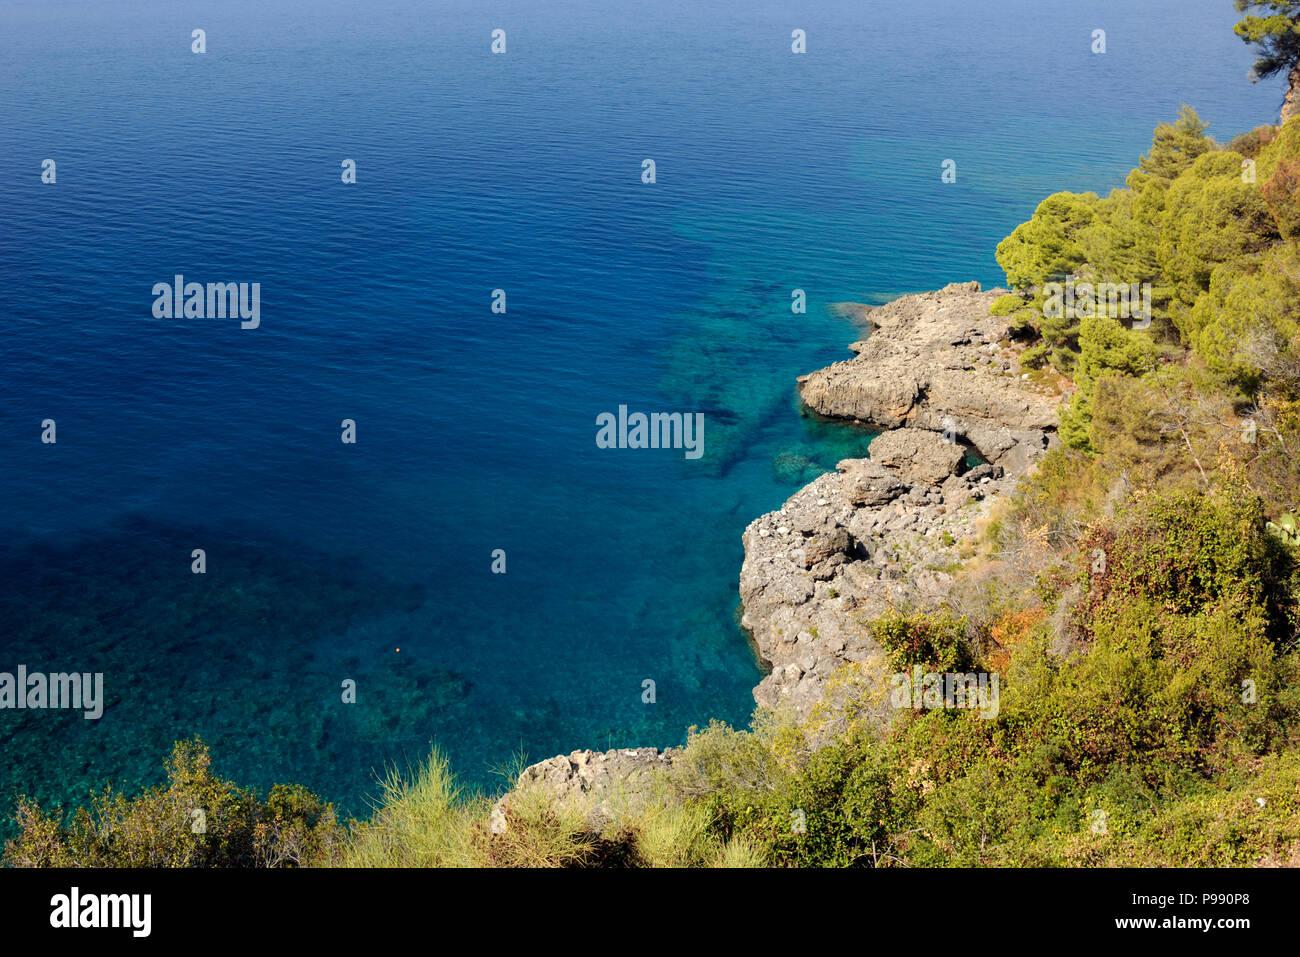 italy, basilicata, maratea, acquafredda Stock Photo